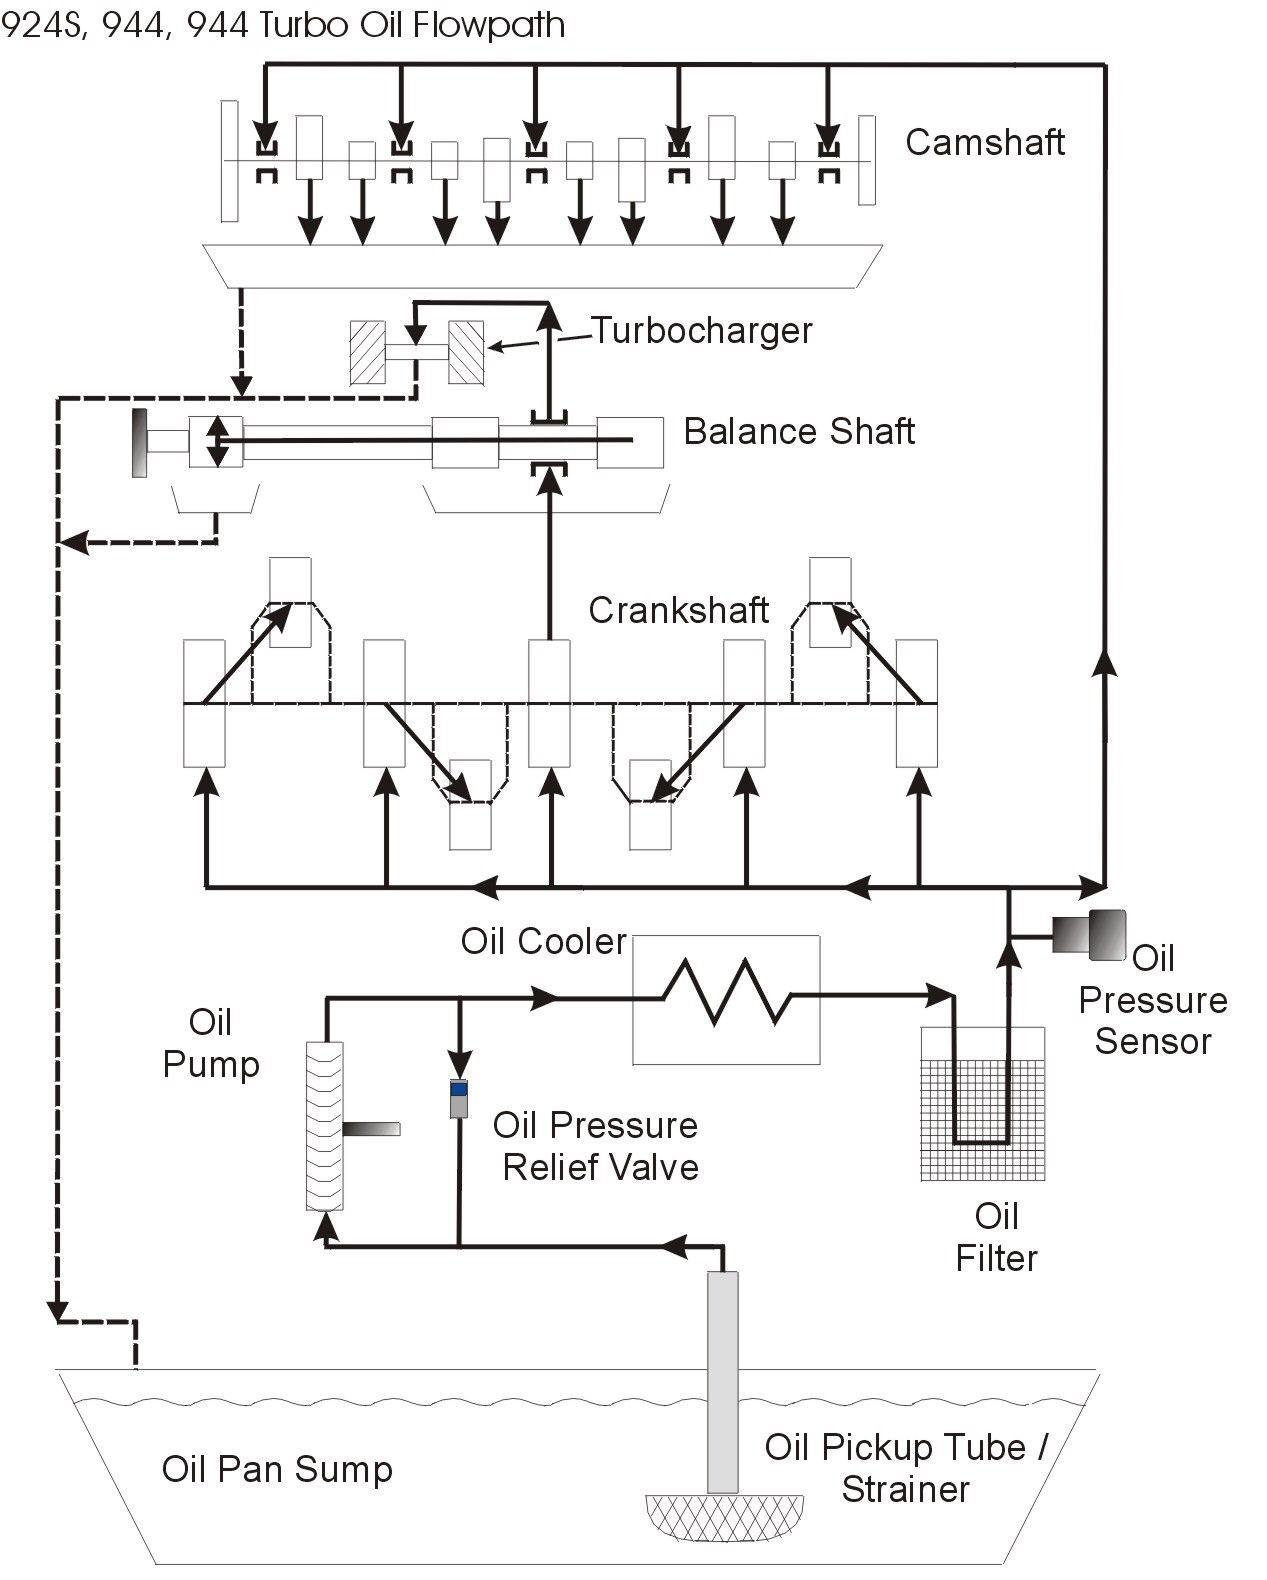 Air Cooled Engine Diagram Porsche 944 Engine Oil Flow Porsche Transaxles Of Air Cooled Engine Diagram